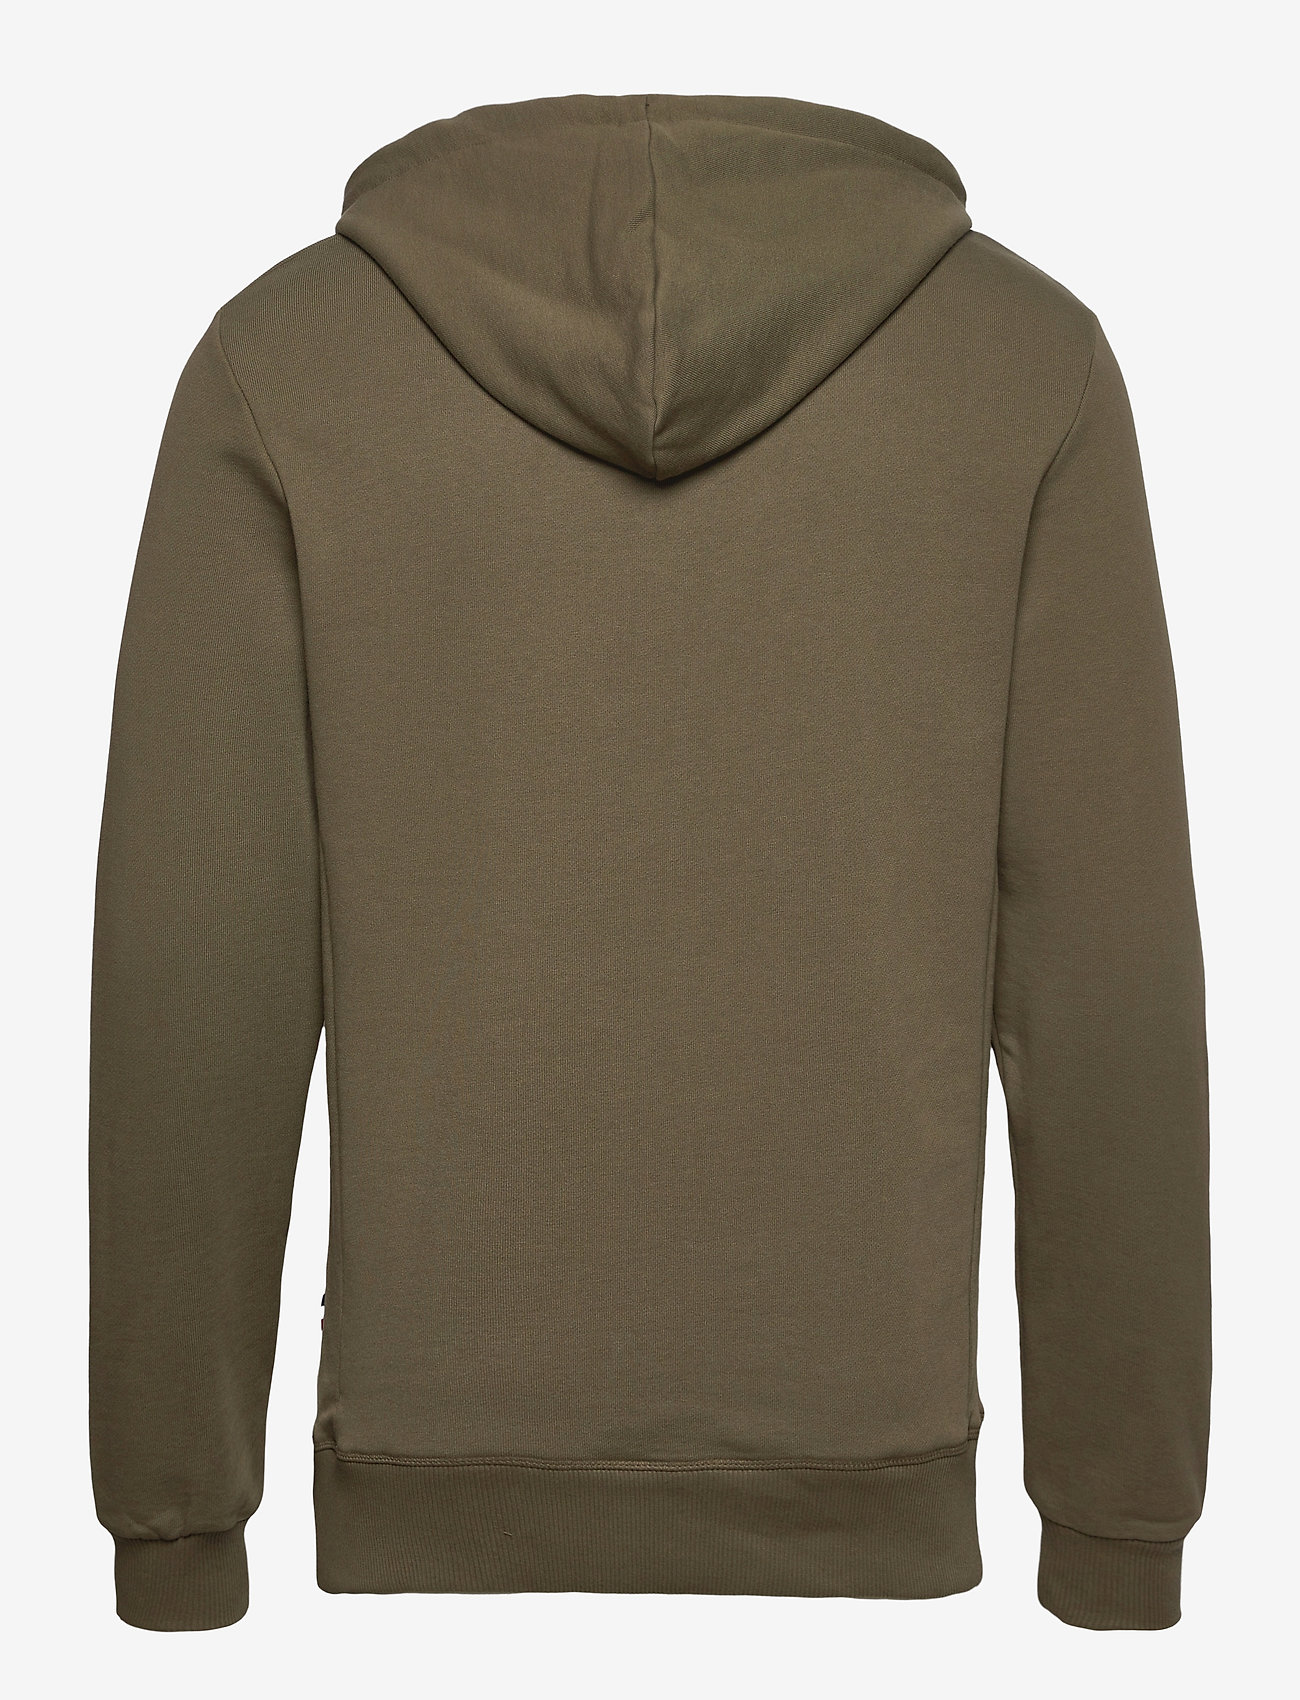 Les Deux Shield Hoodie - Sweatshirts TURTLE GREEN - Menn Klær